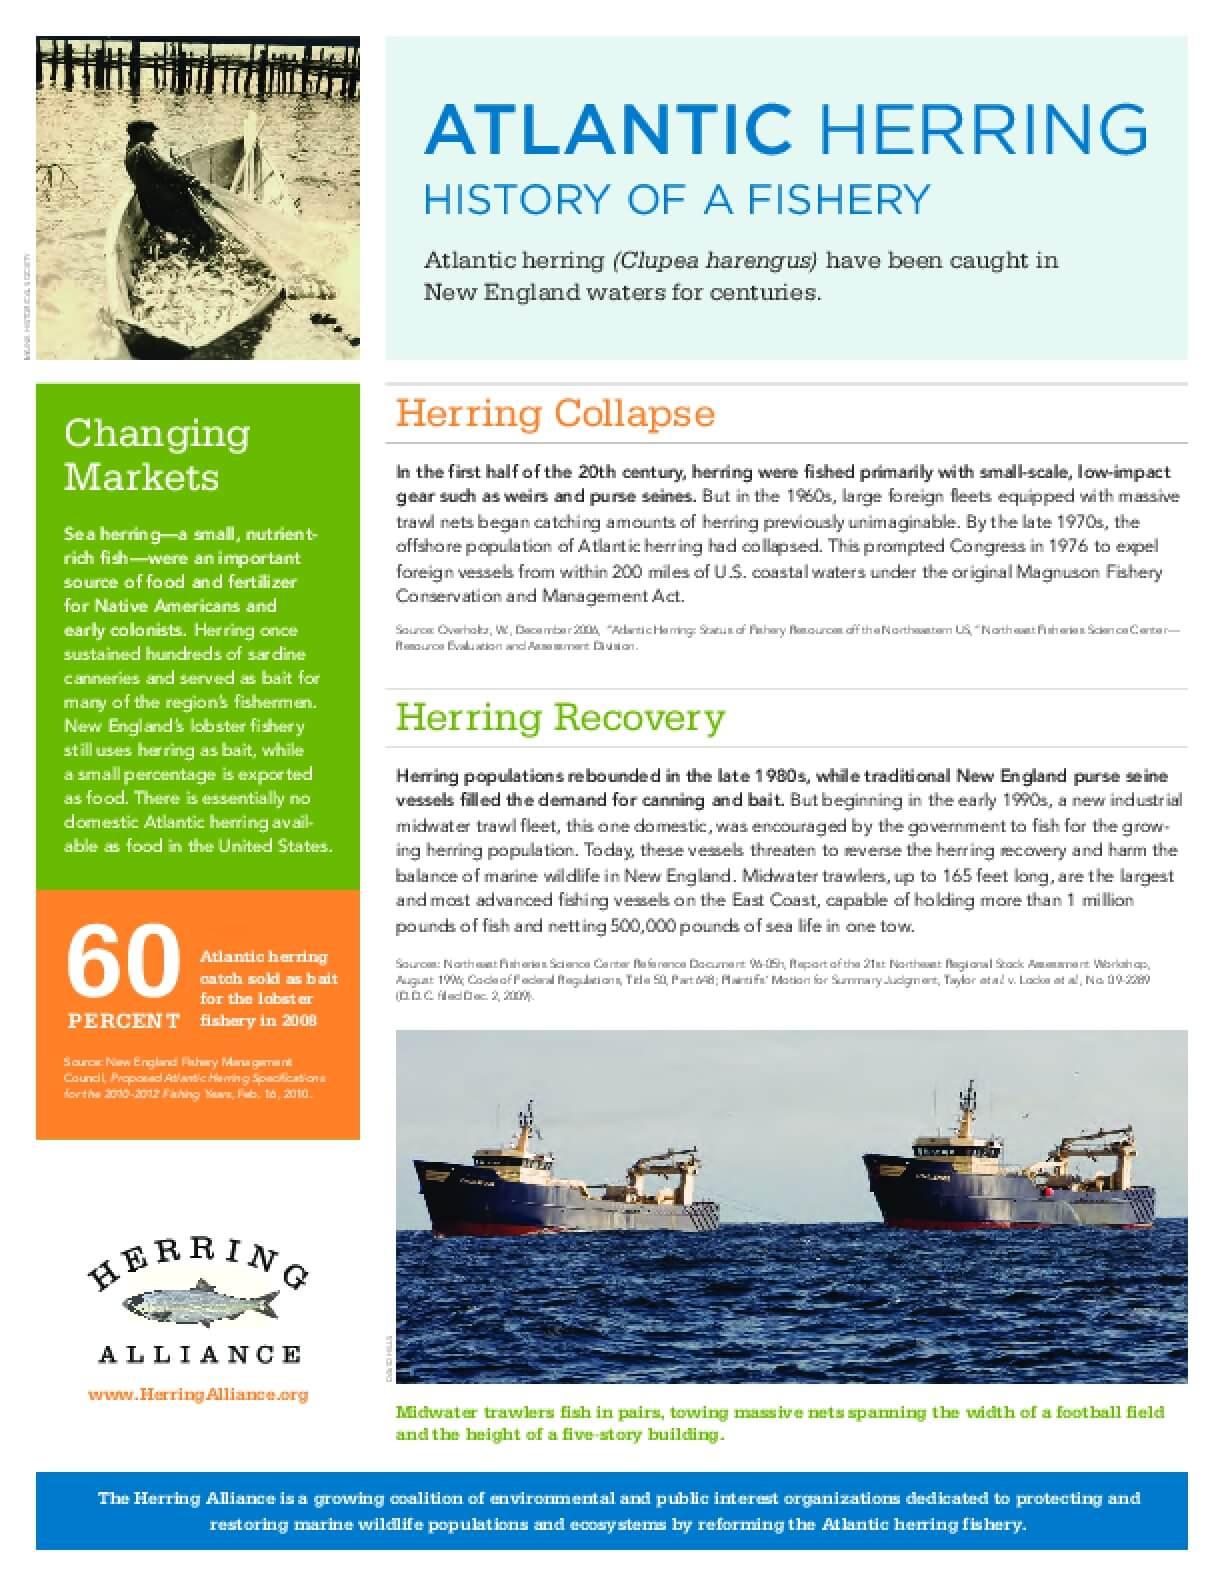 Atlantic Herring: History of a Fishery